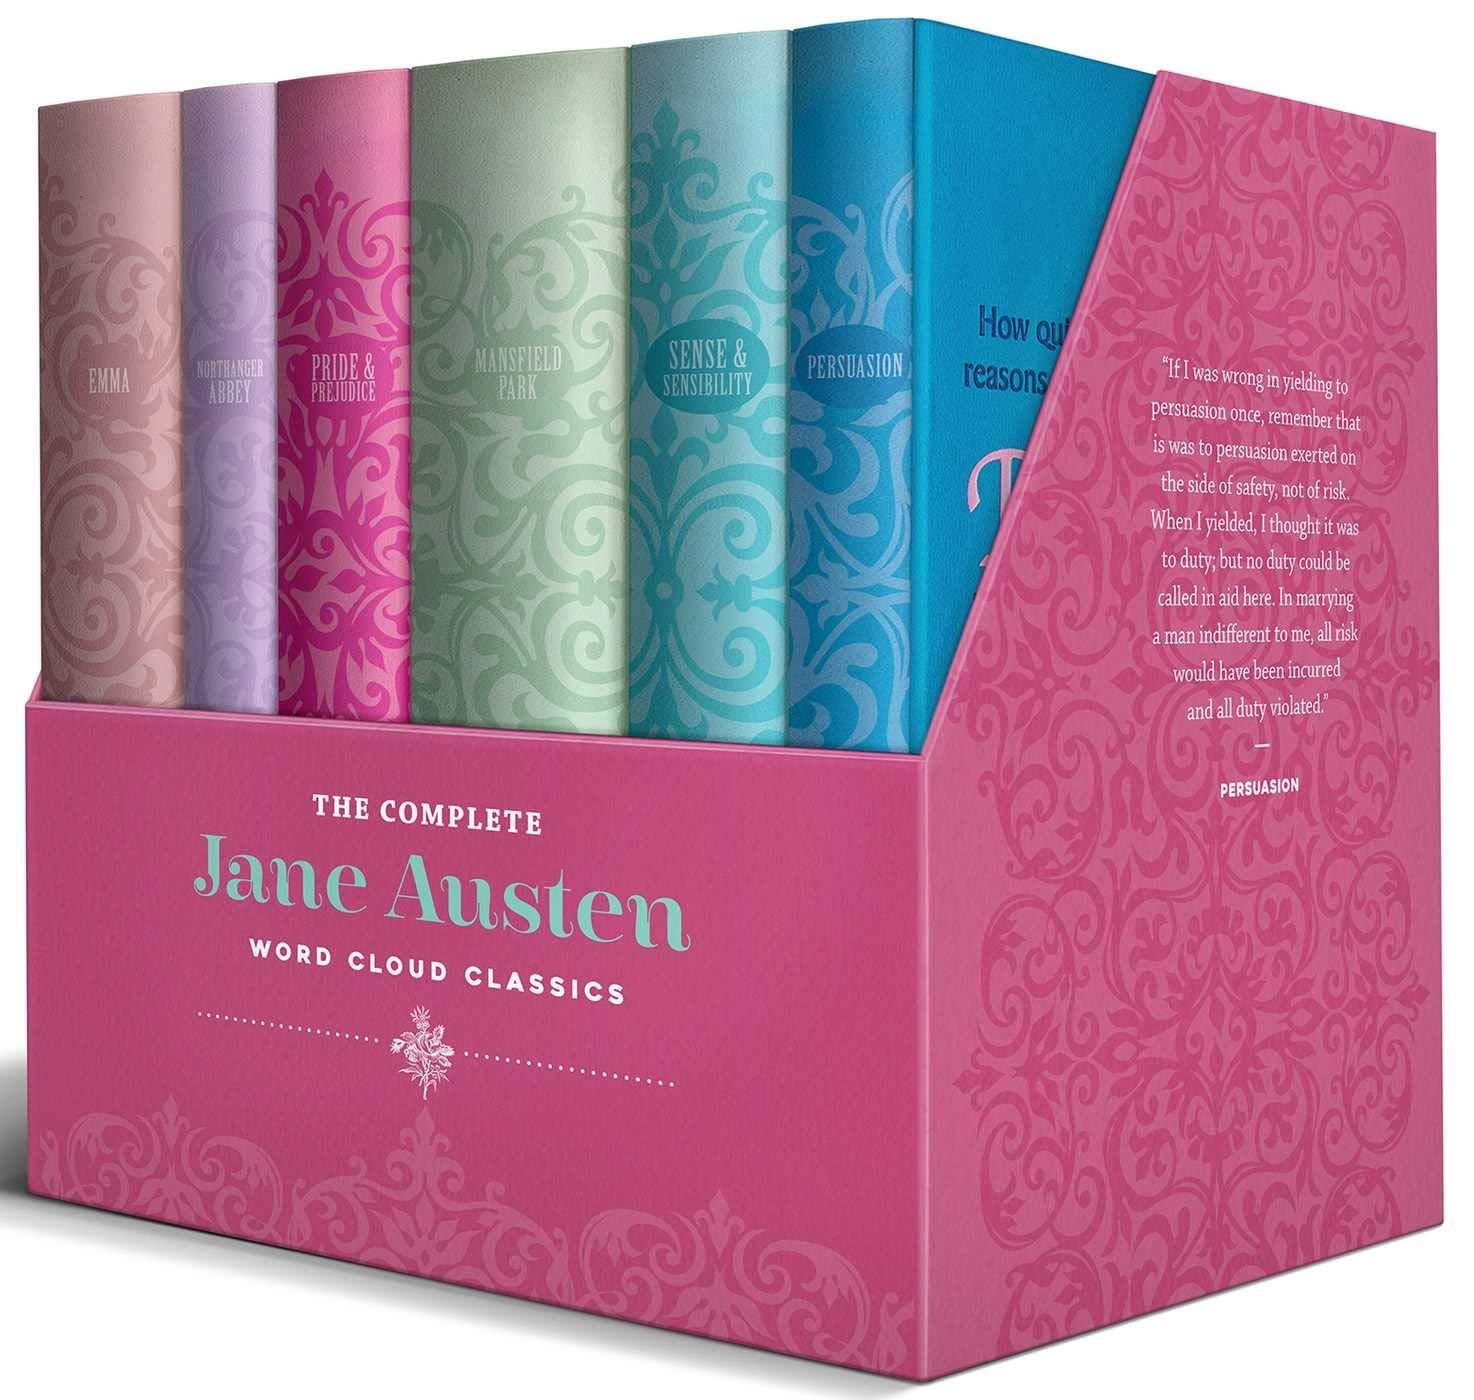 Jane Austen (Word Cloud Classics): Amazon.es: Austen, Jane, Austen, Jane: Libros en idiomas extranjeros